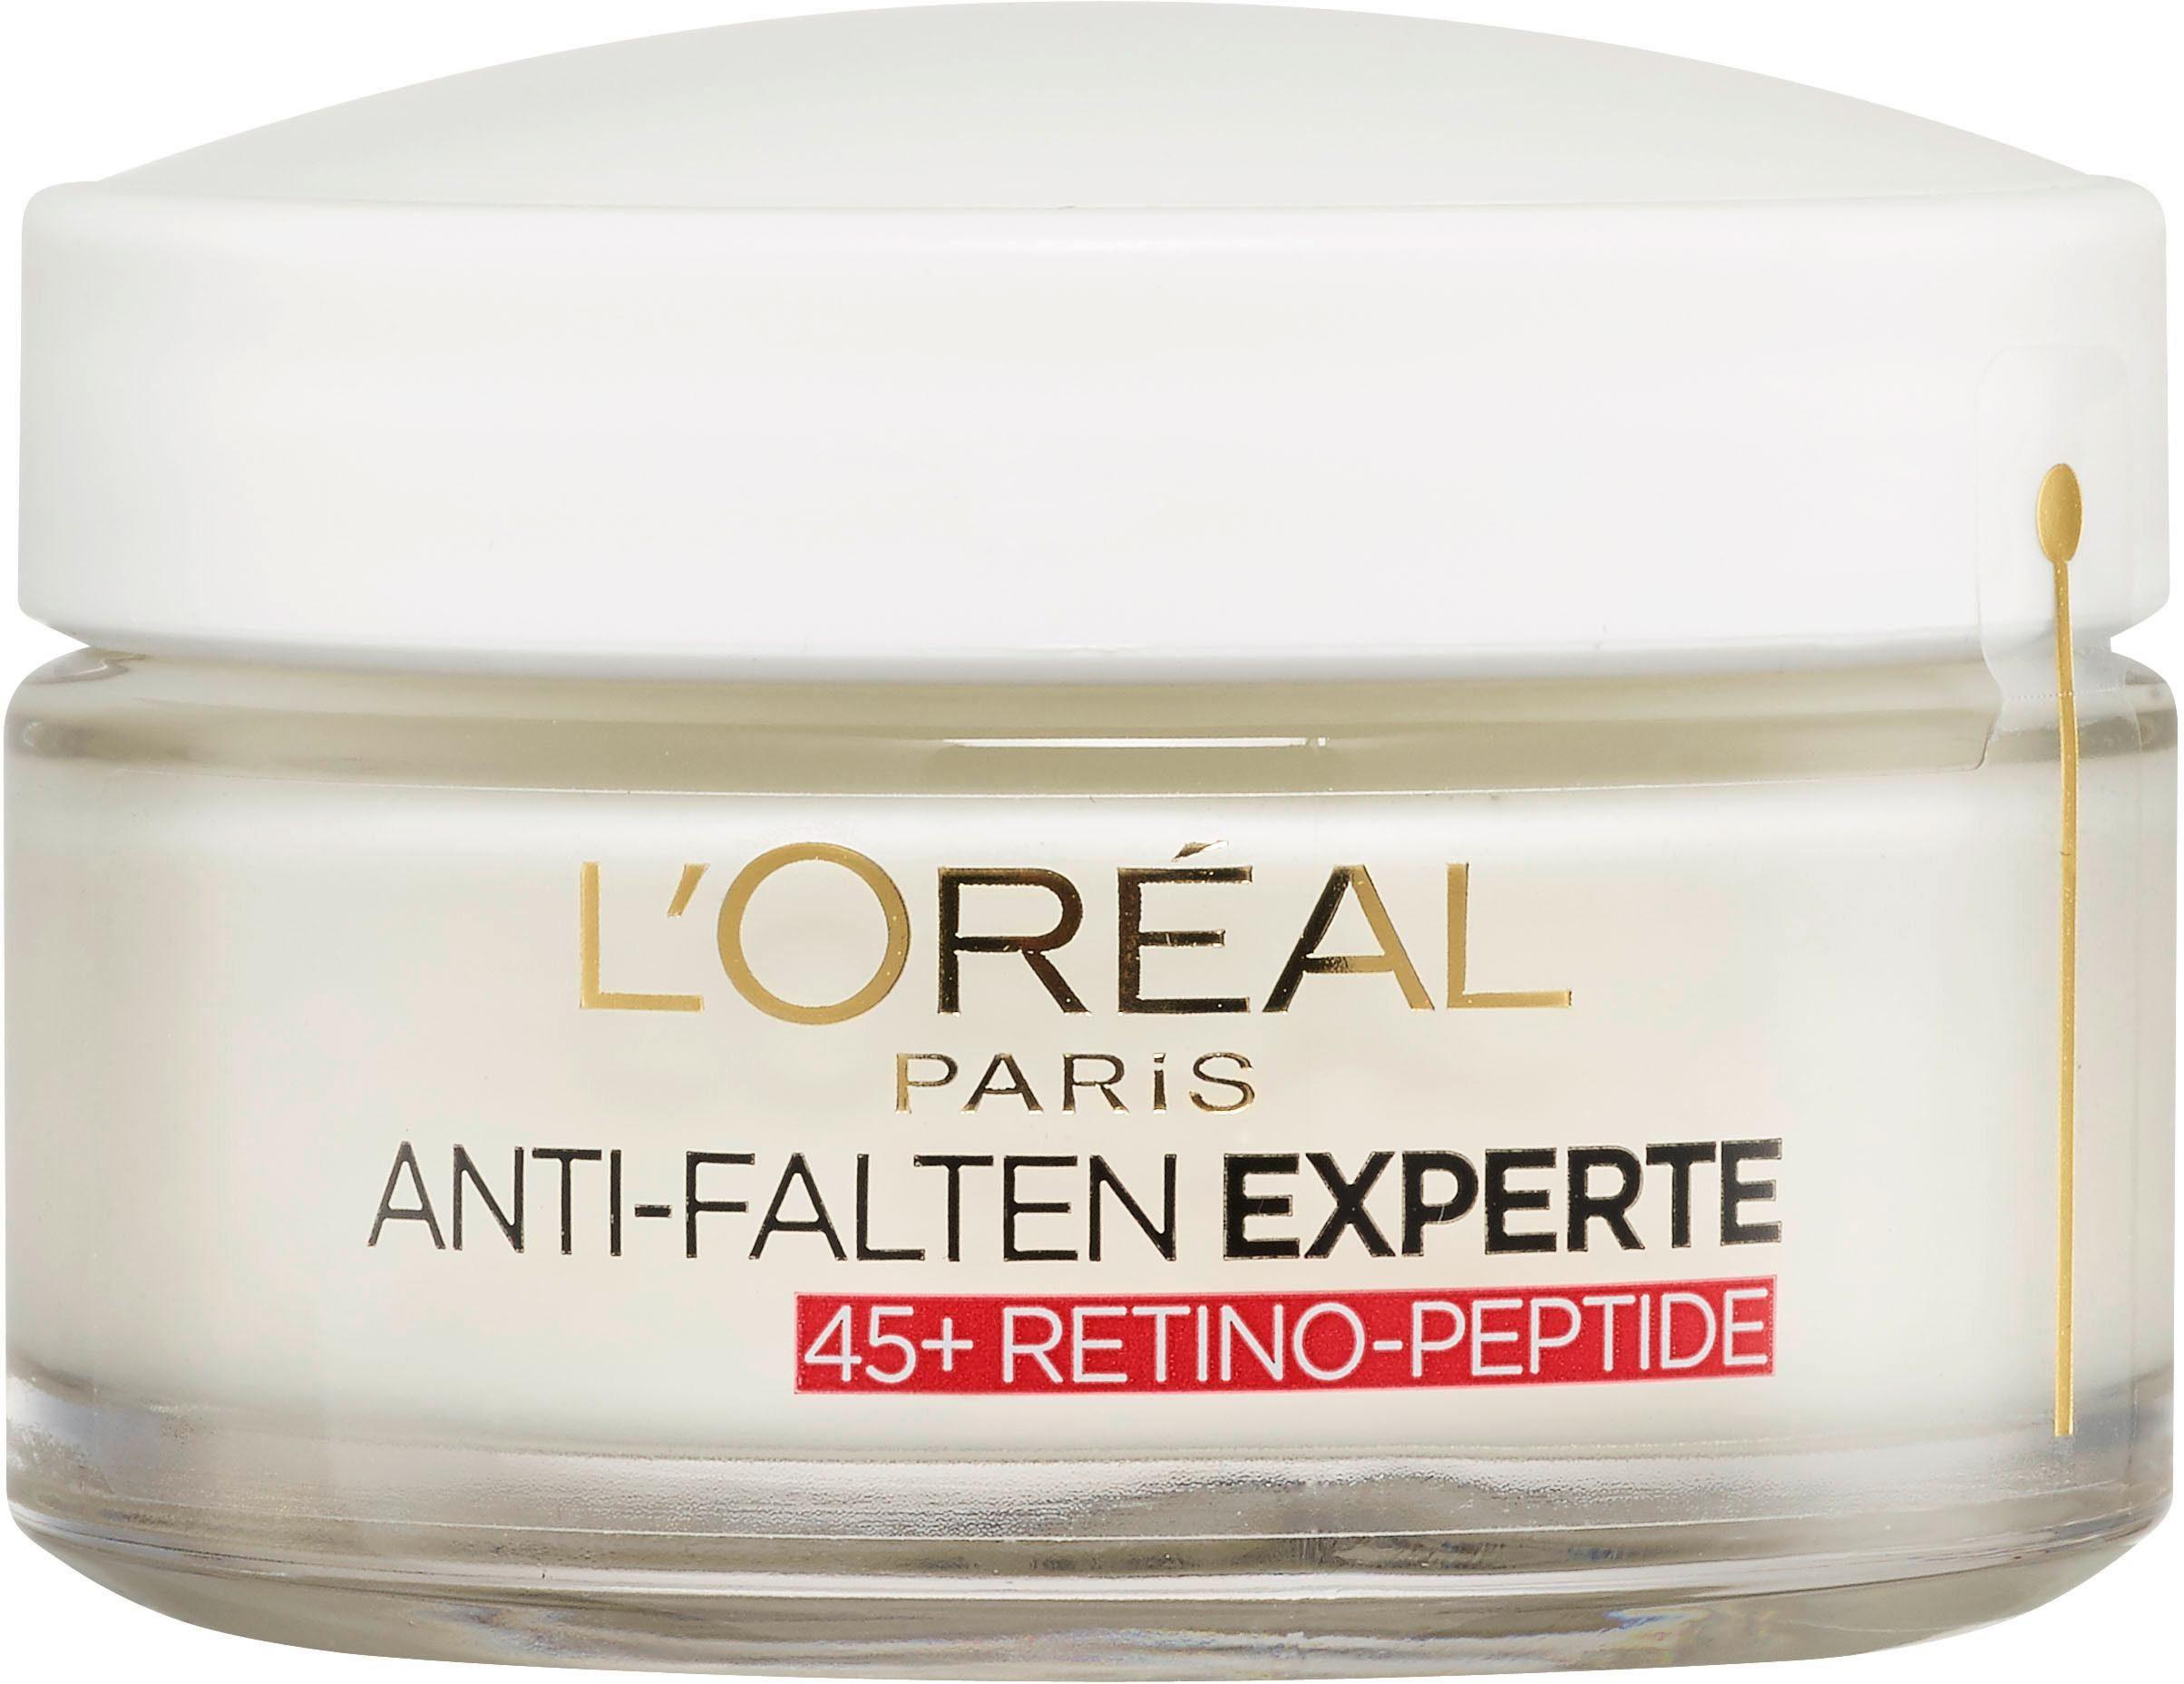 L'Oréal Paris, »Anti-Falten-Expert Retino Peptide 45+«, Gesichtspflege